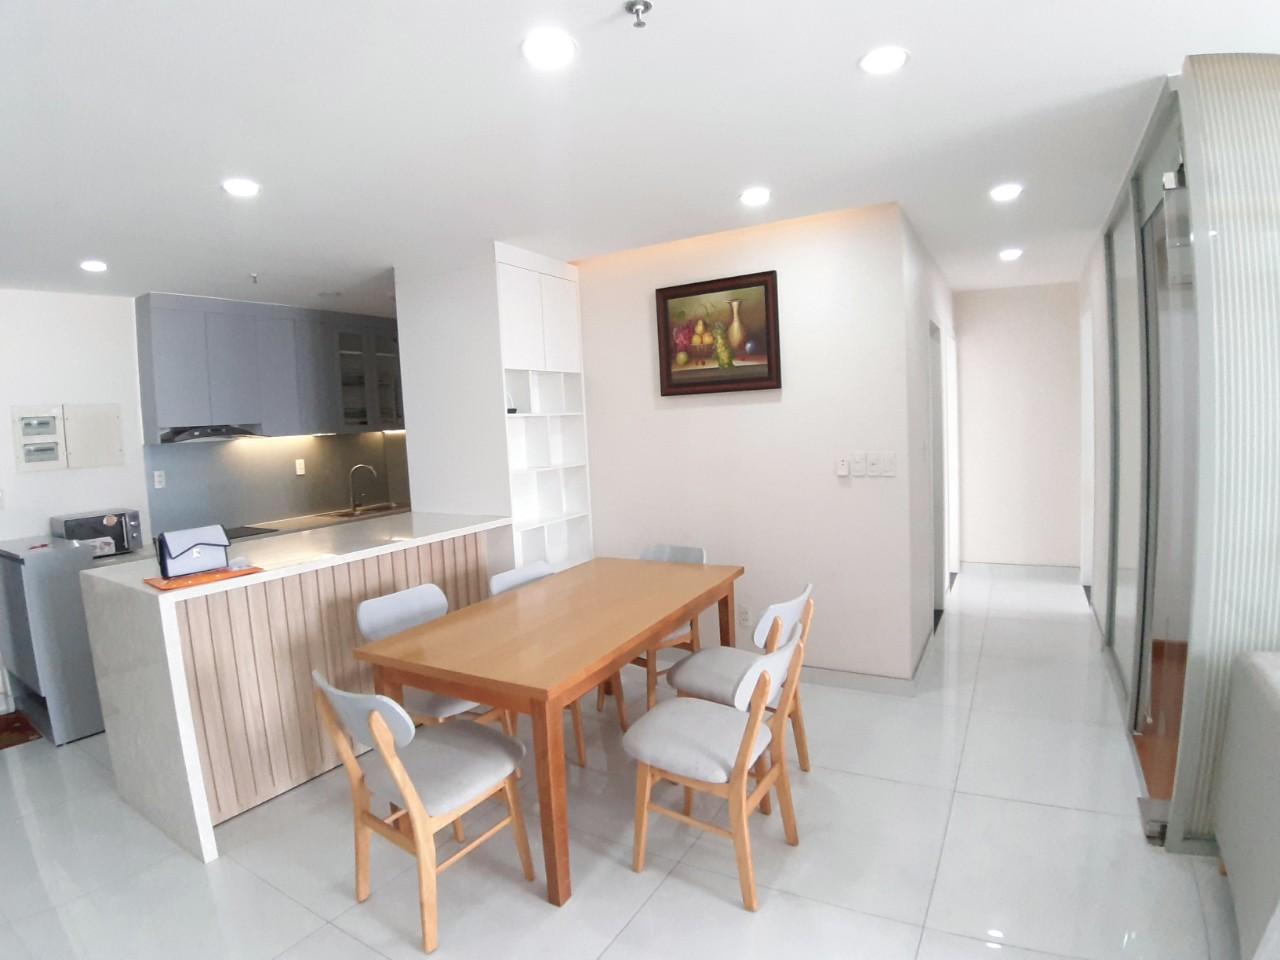 2bedrooms for rent in scenic  valley